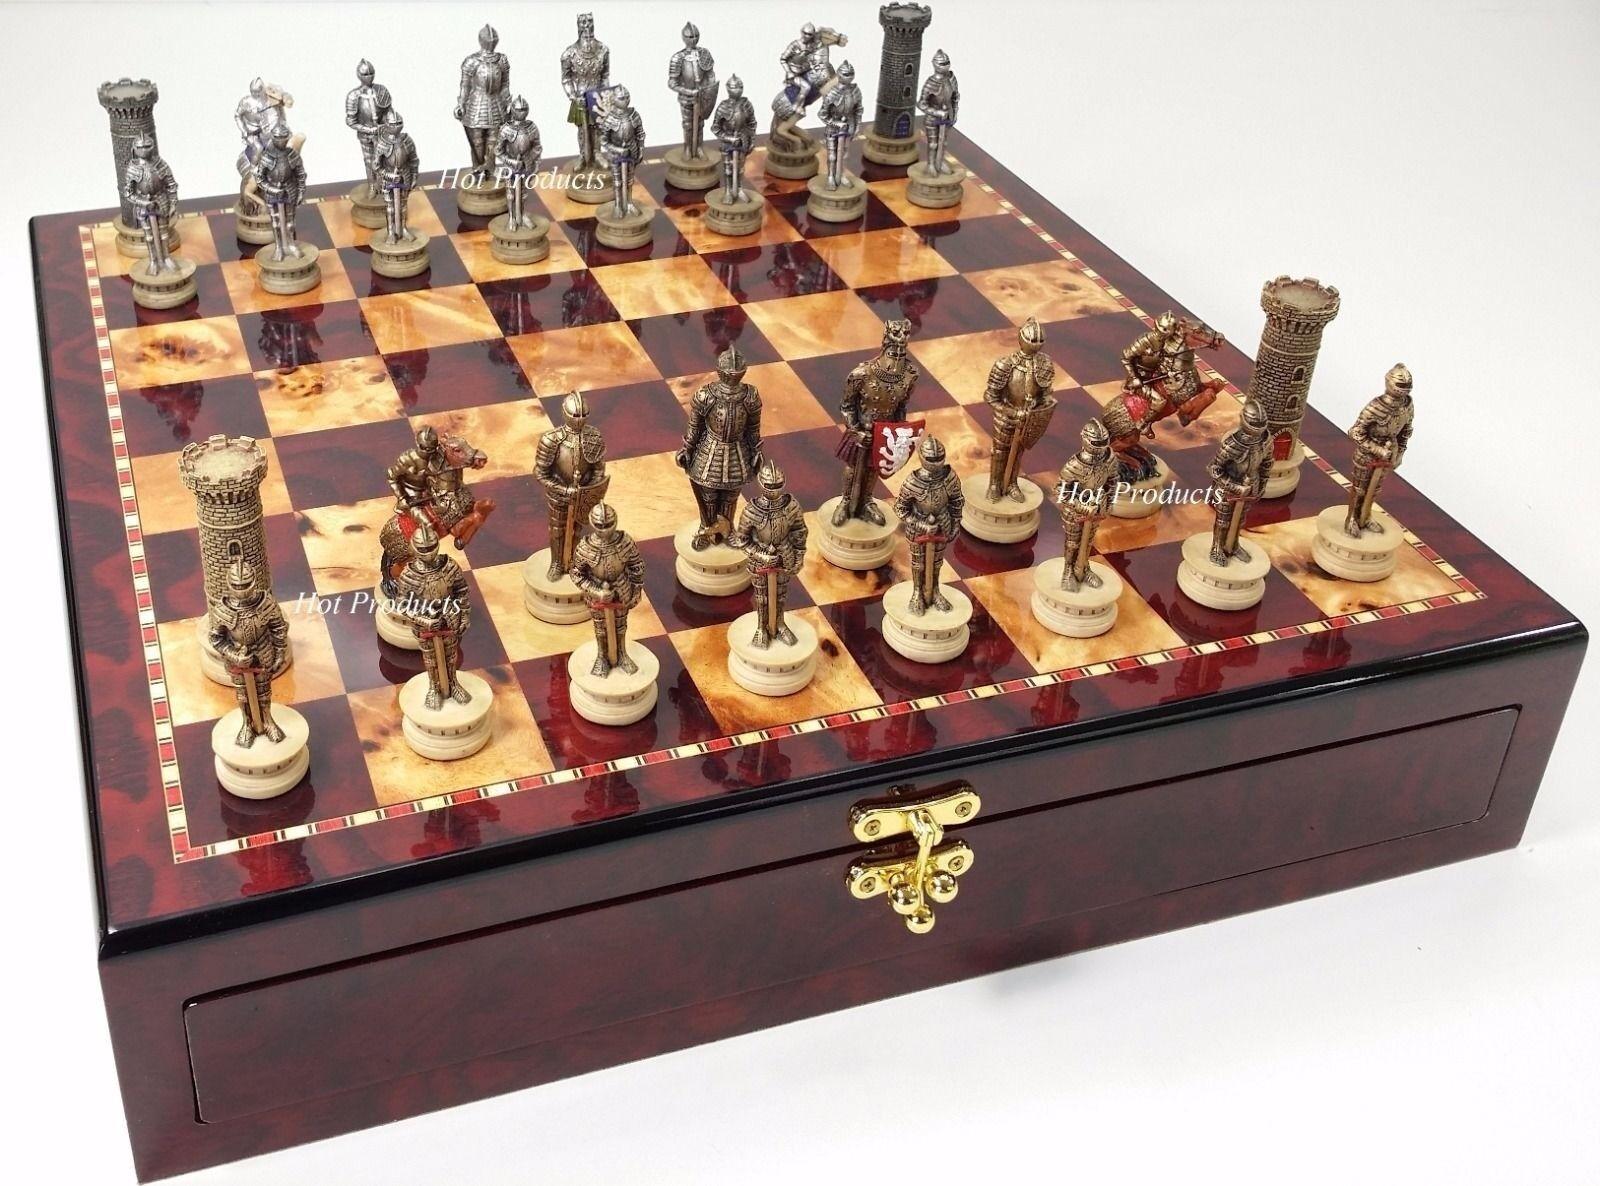 Moyen âge croisades armoruge  knight Chess Set cerise couleur de conservation Board  promotions discount